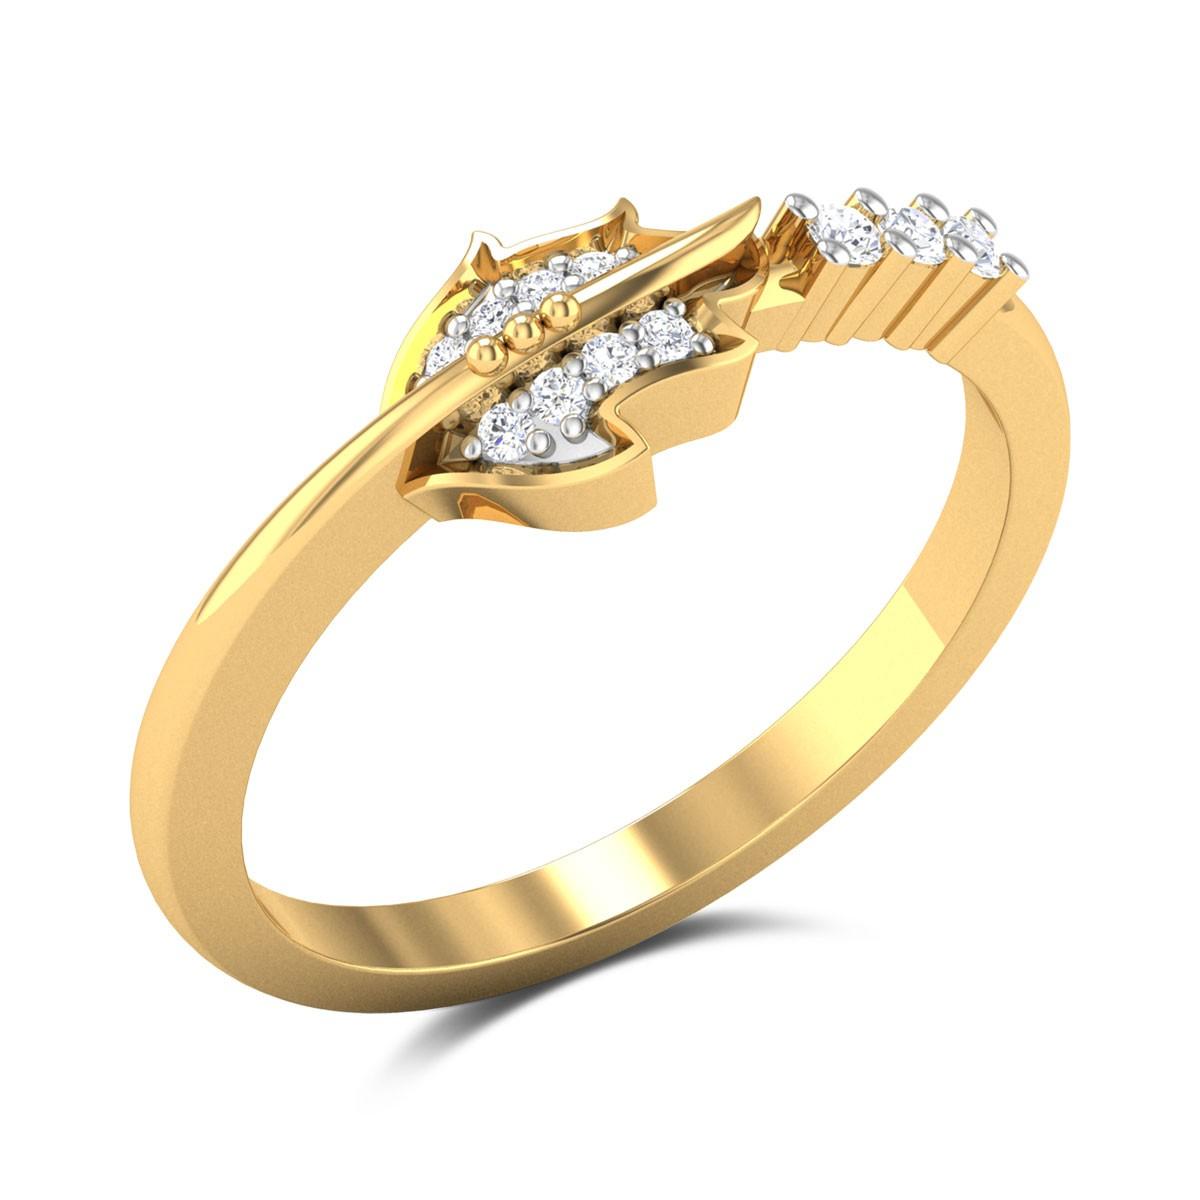 Brille Diamond Ring